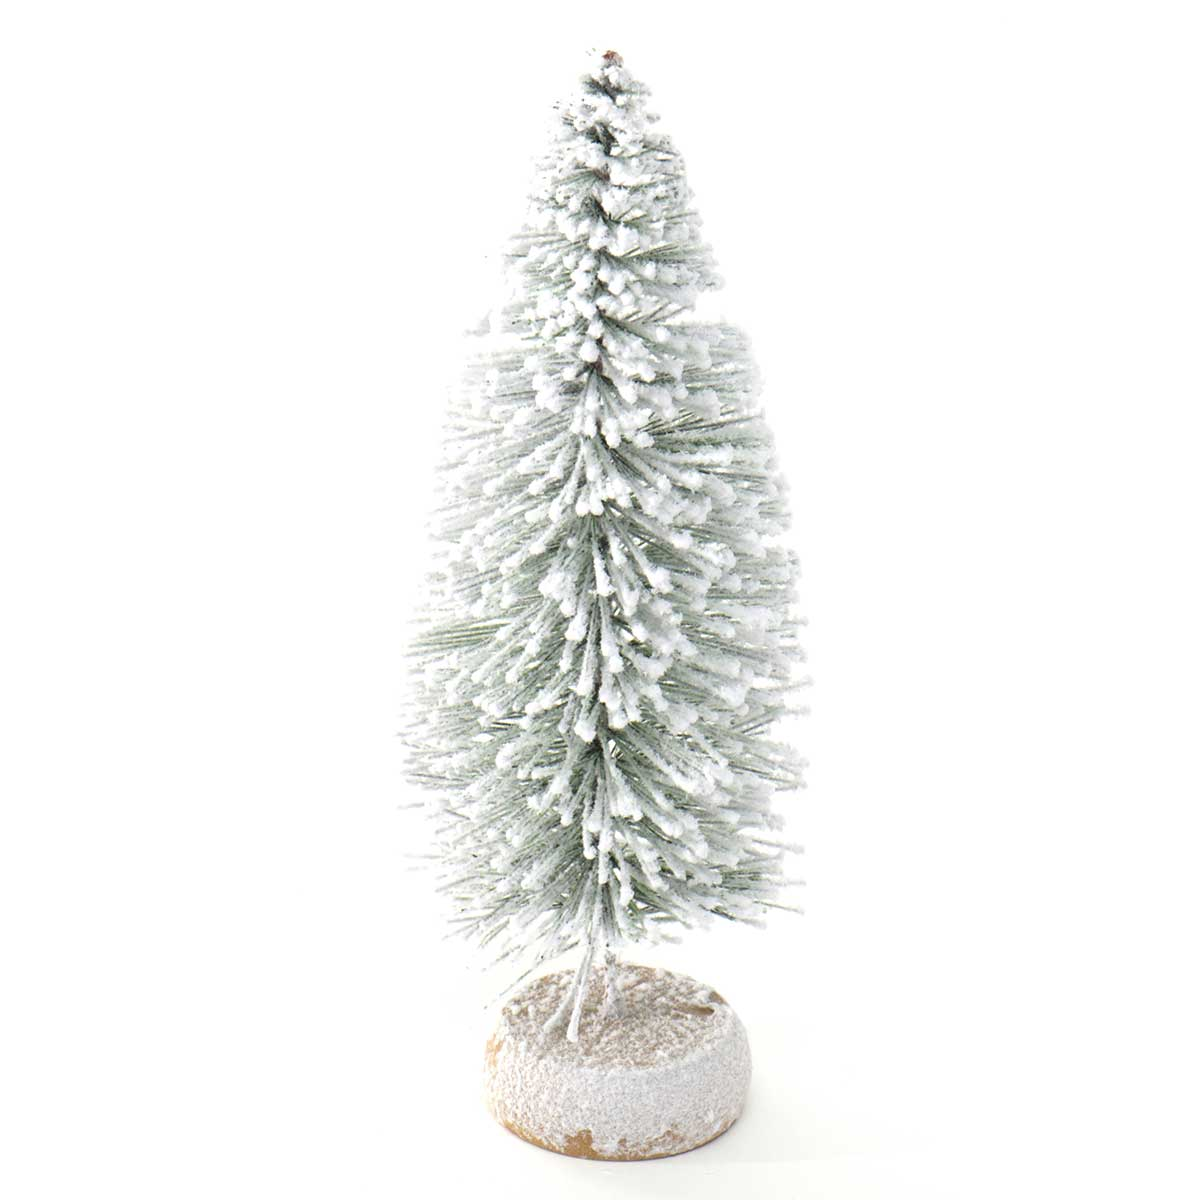 "MINI TREE WITH SNOW 3""X9.5"""